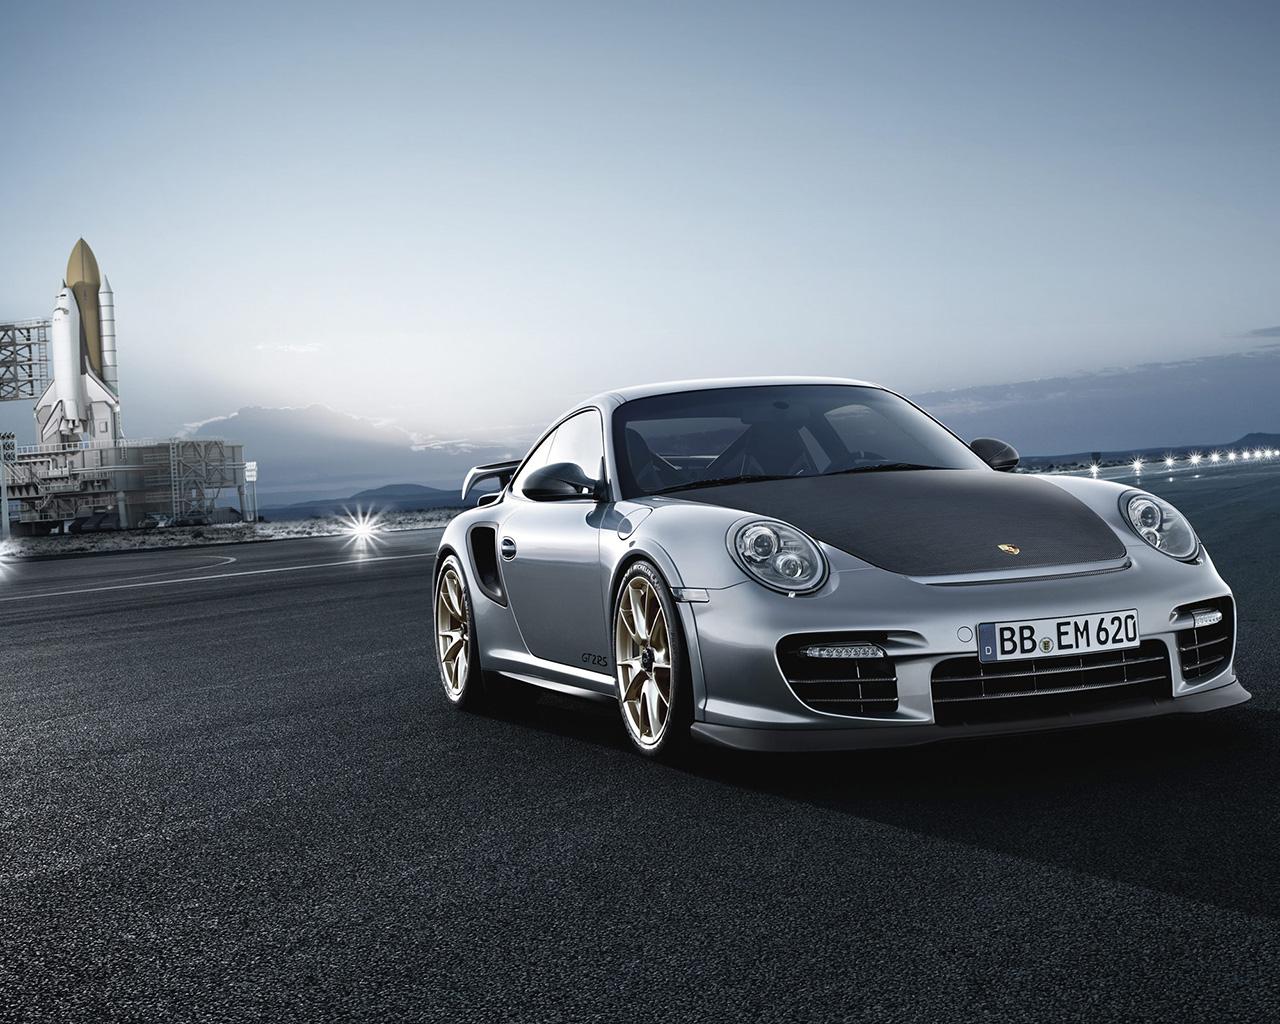 Porsche Zentrum Stuttgart 187 Background Images